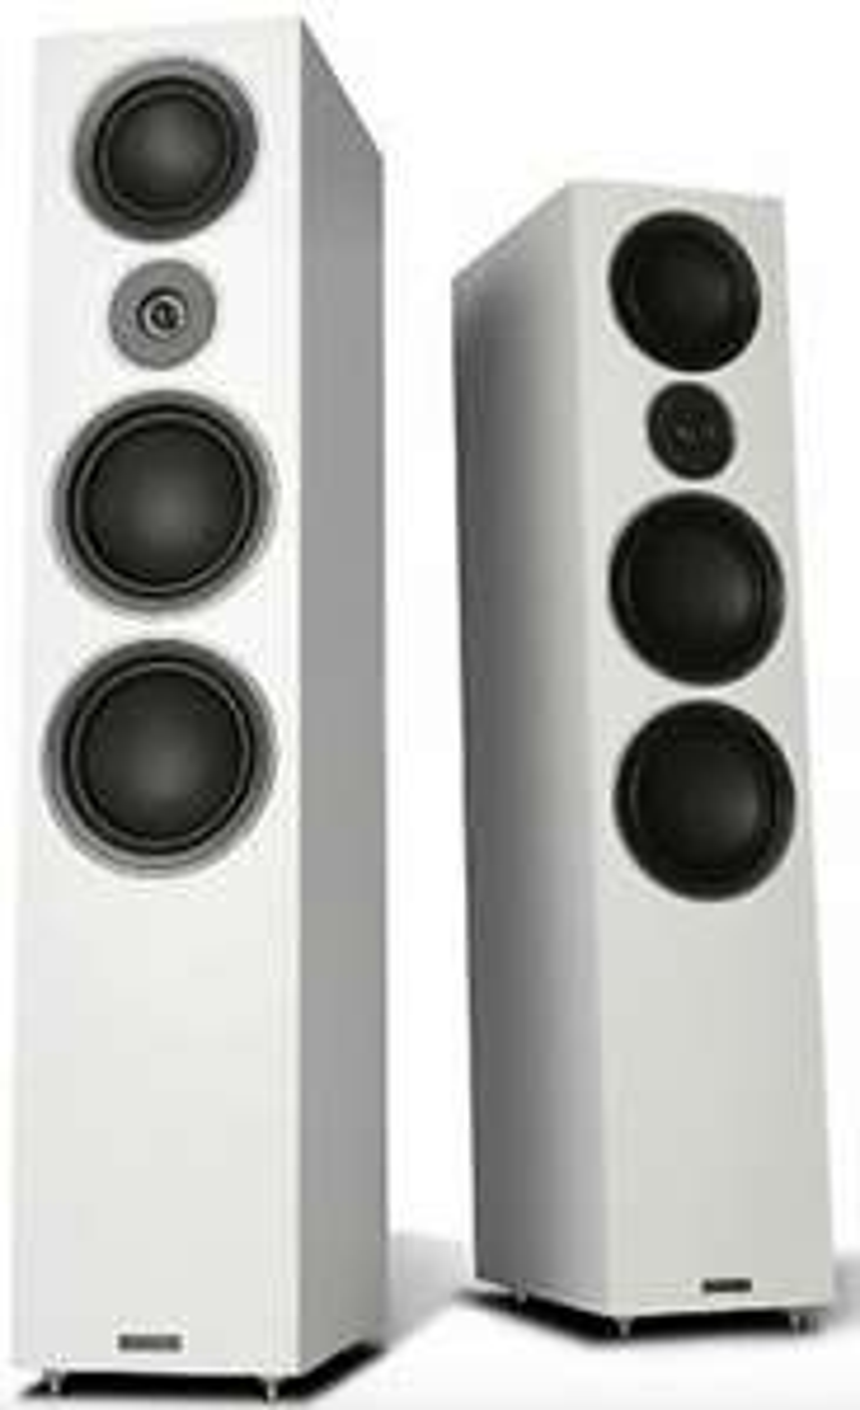 Mission LX-5 Floorstand Speaker - White Sandex (pair) / MH-028490-00B - £624.97 with code @ eBay / teashop